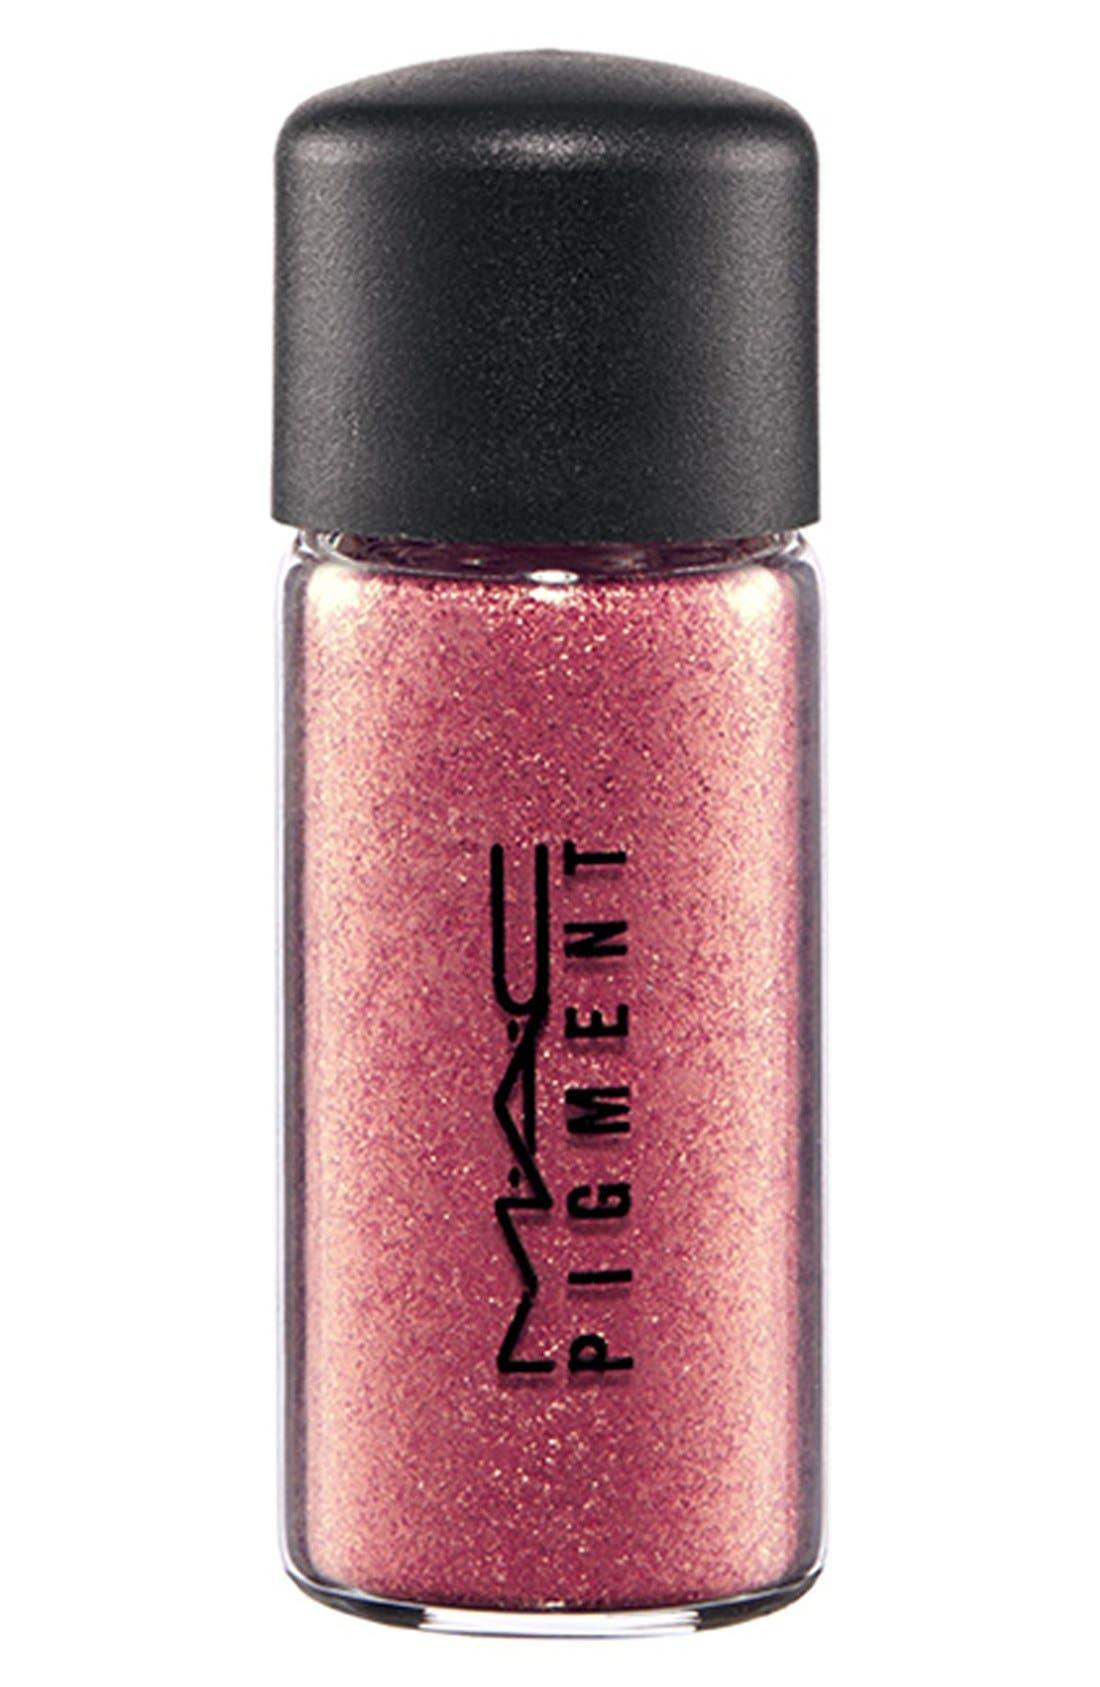 MAC Little MAC Pigment,                             Main thumbnail 1, color,                             ROSE